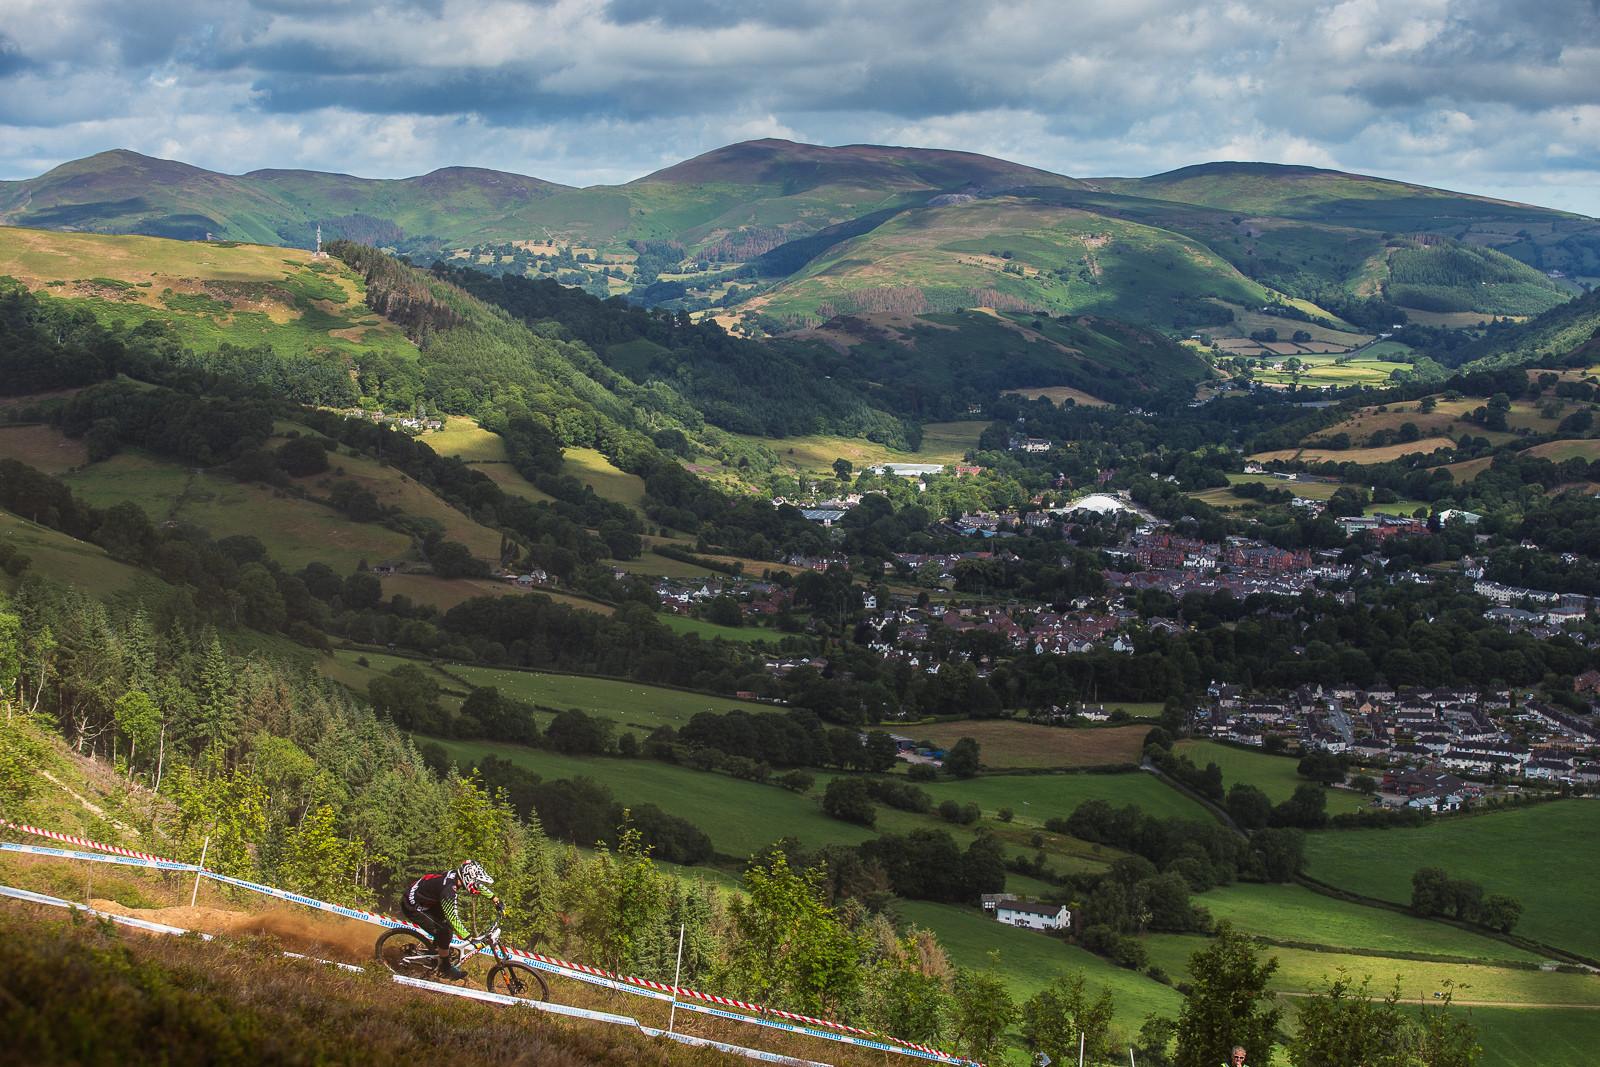 2015 British National Champs Downhill - 2015 British National Champs Downhill Photos - Mountain Biking Pictures - Vital MTB